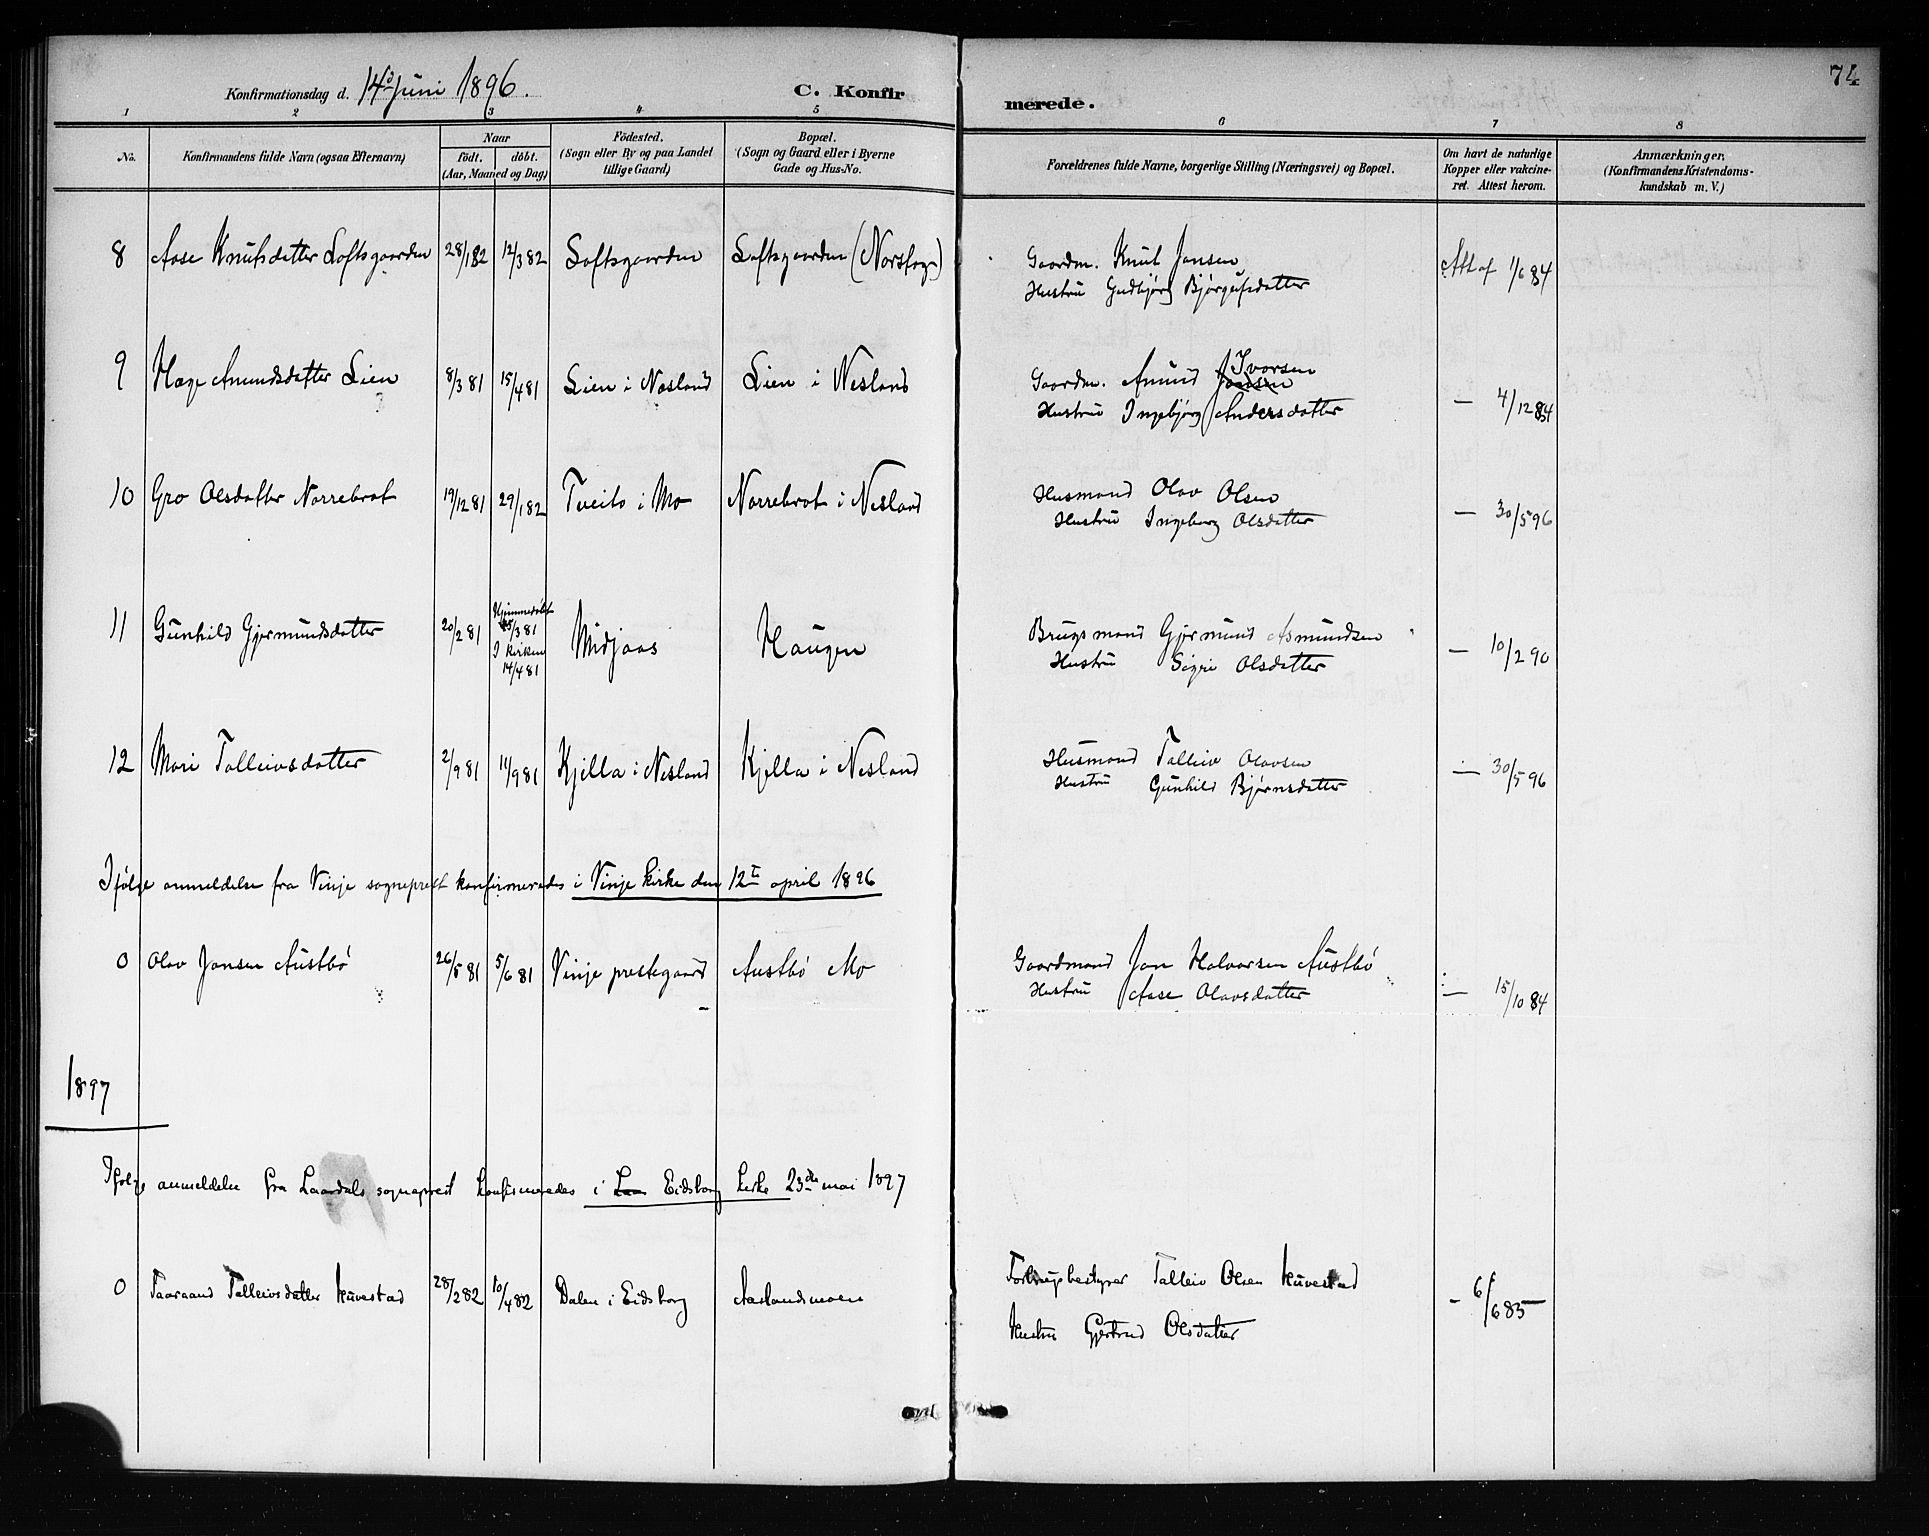 SAKO, Mo kirkebøker, G/Ga/L0002: Klokkerbok nr. I 2, 1892-1914, s. 74